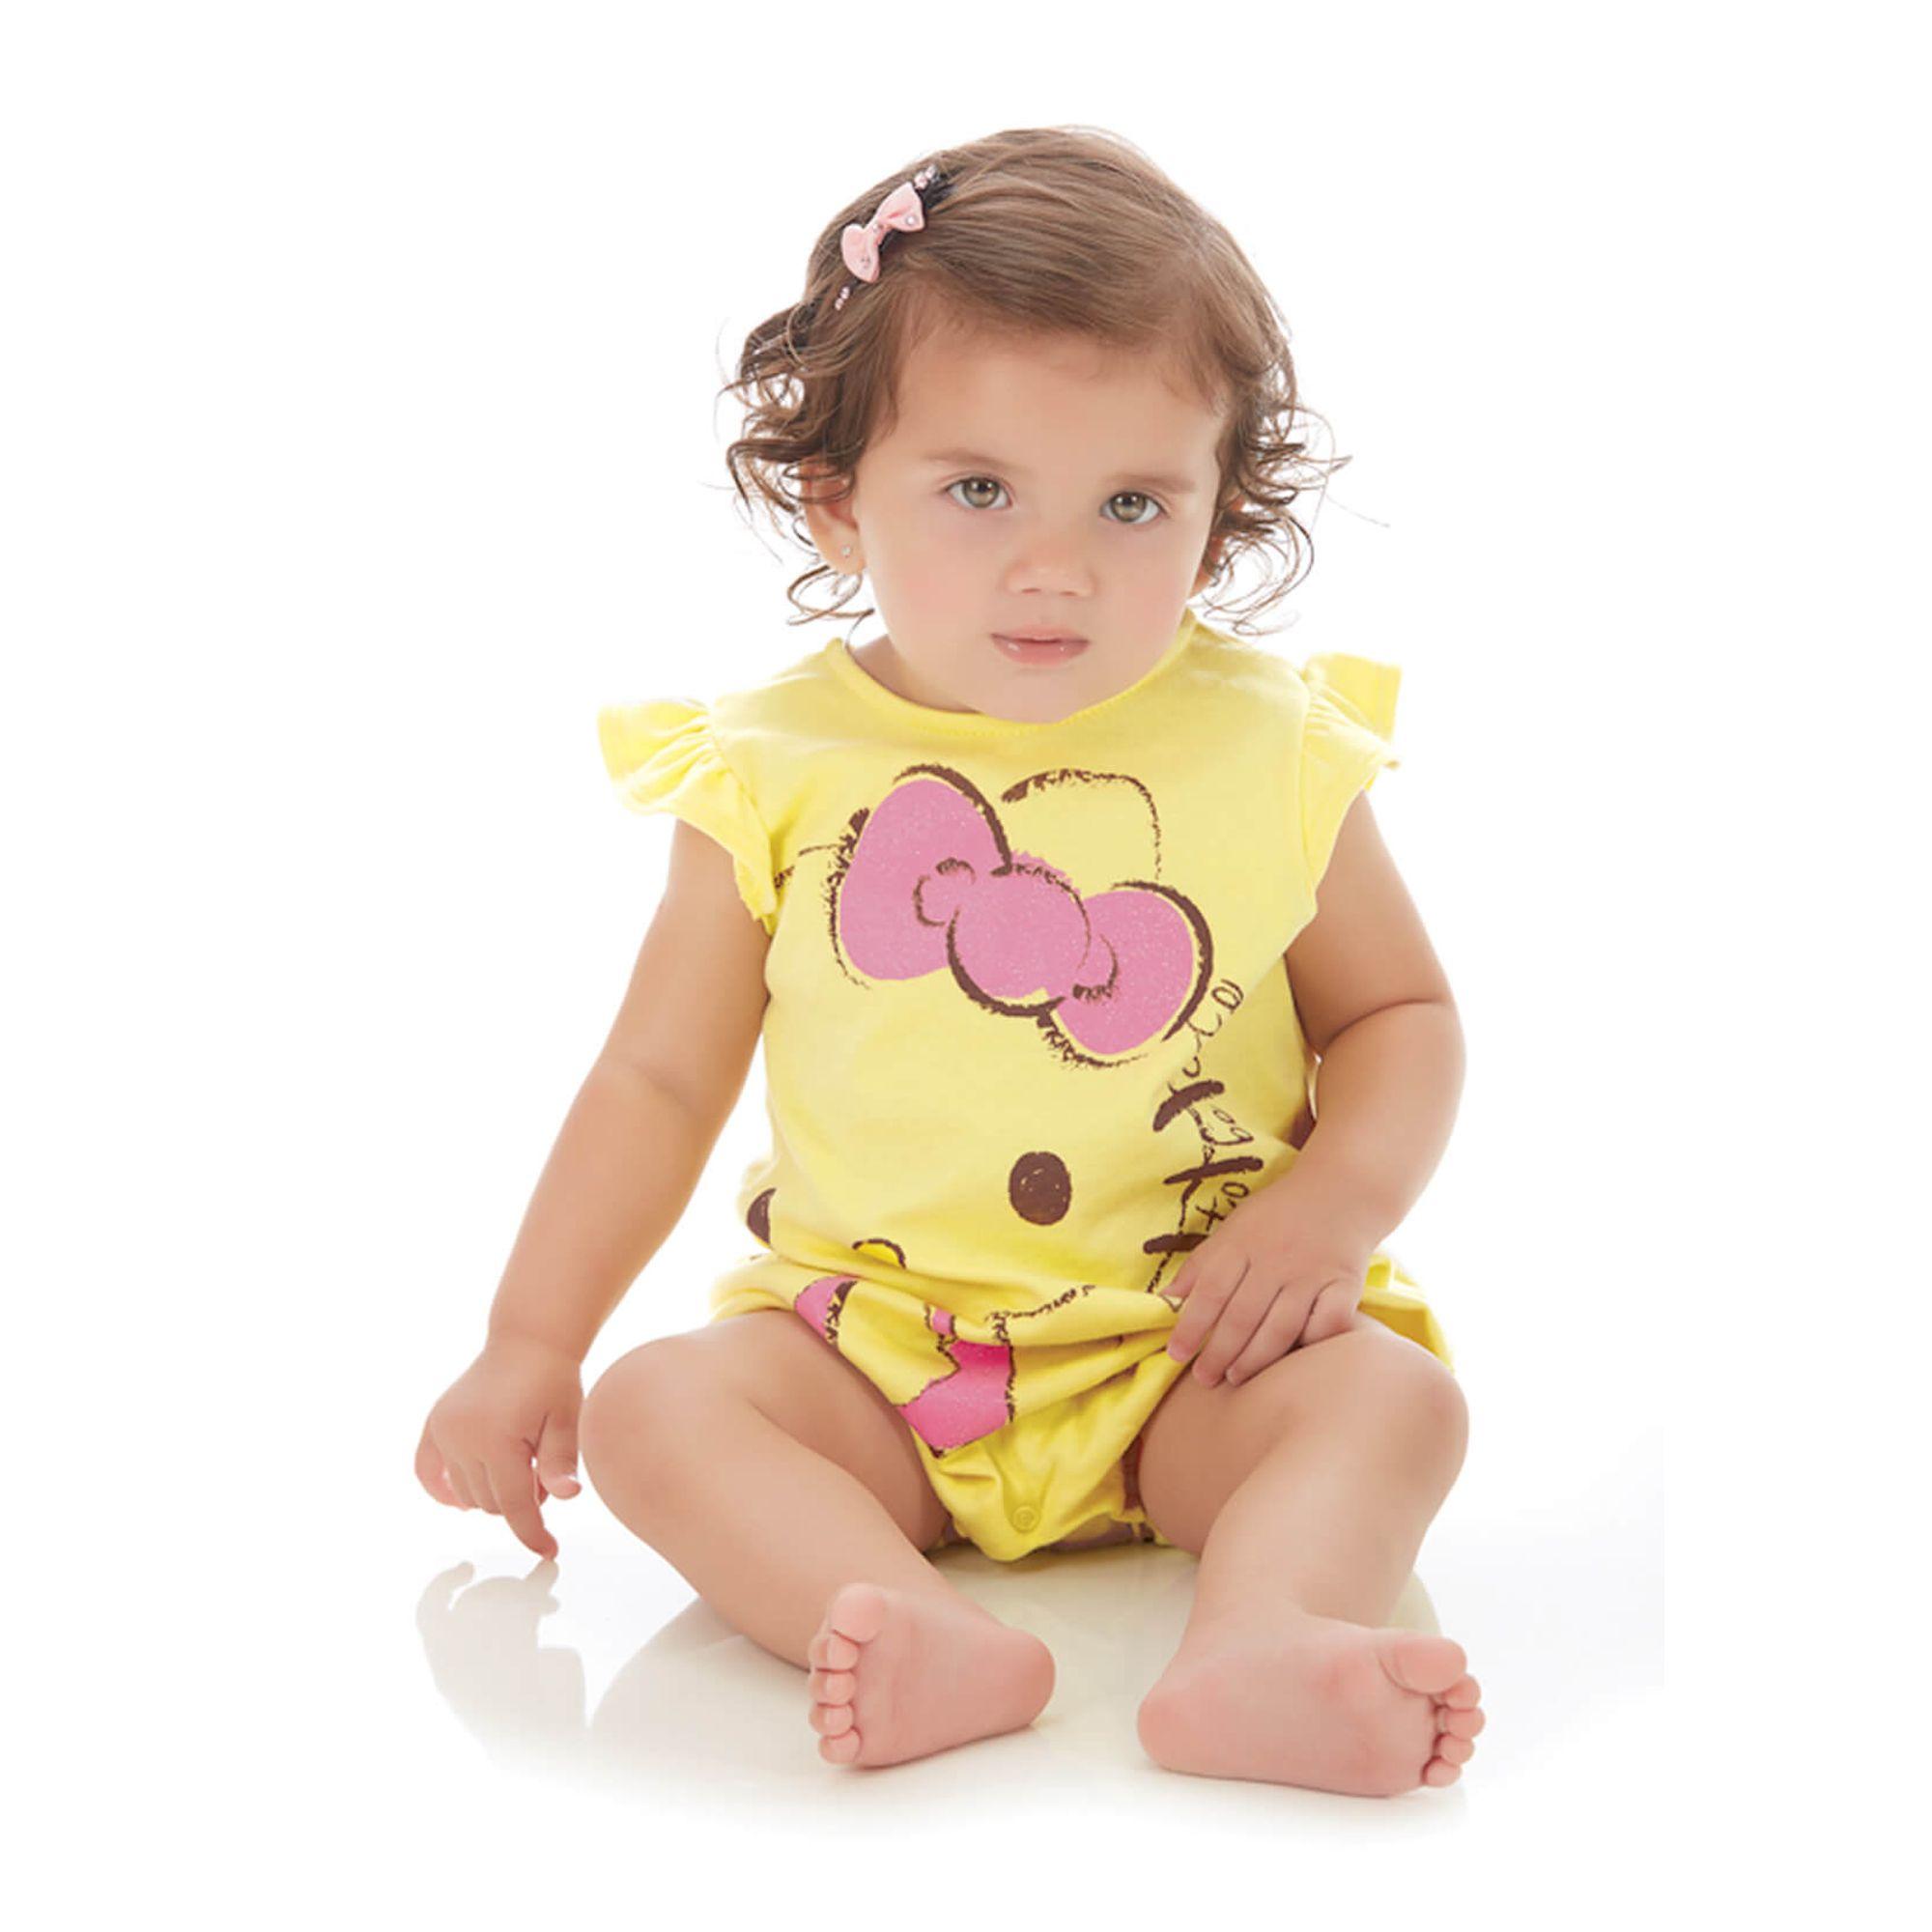 macaquinho-bebe-amarelo-hello-kitty-verao